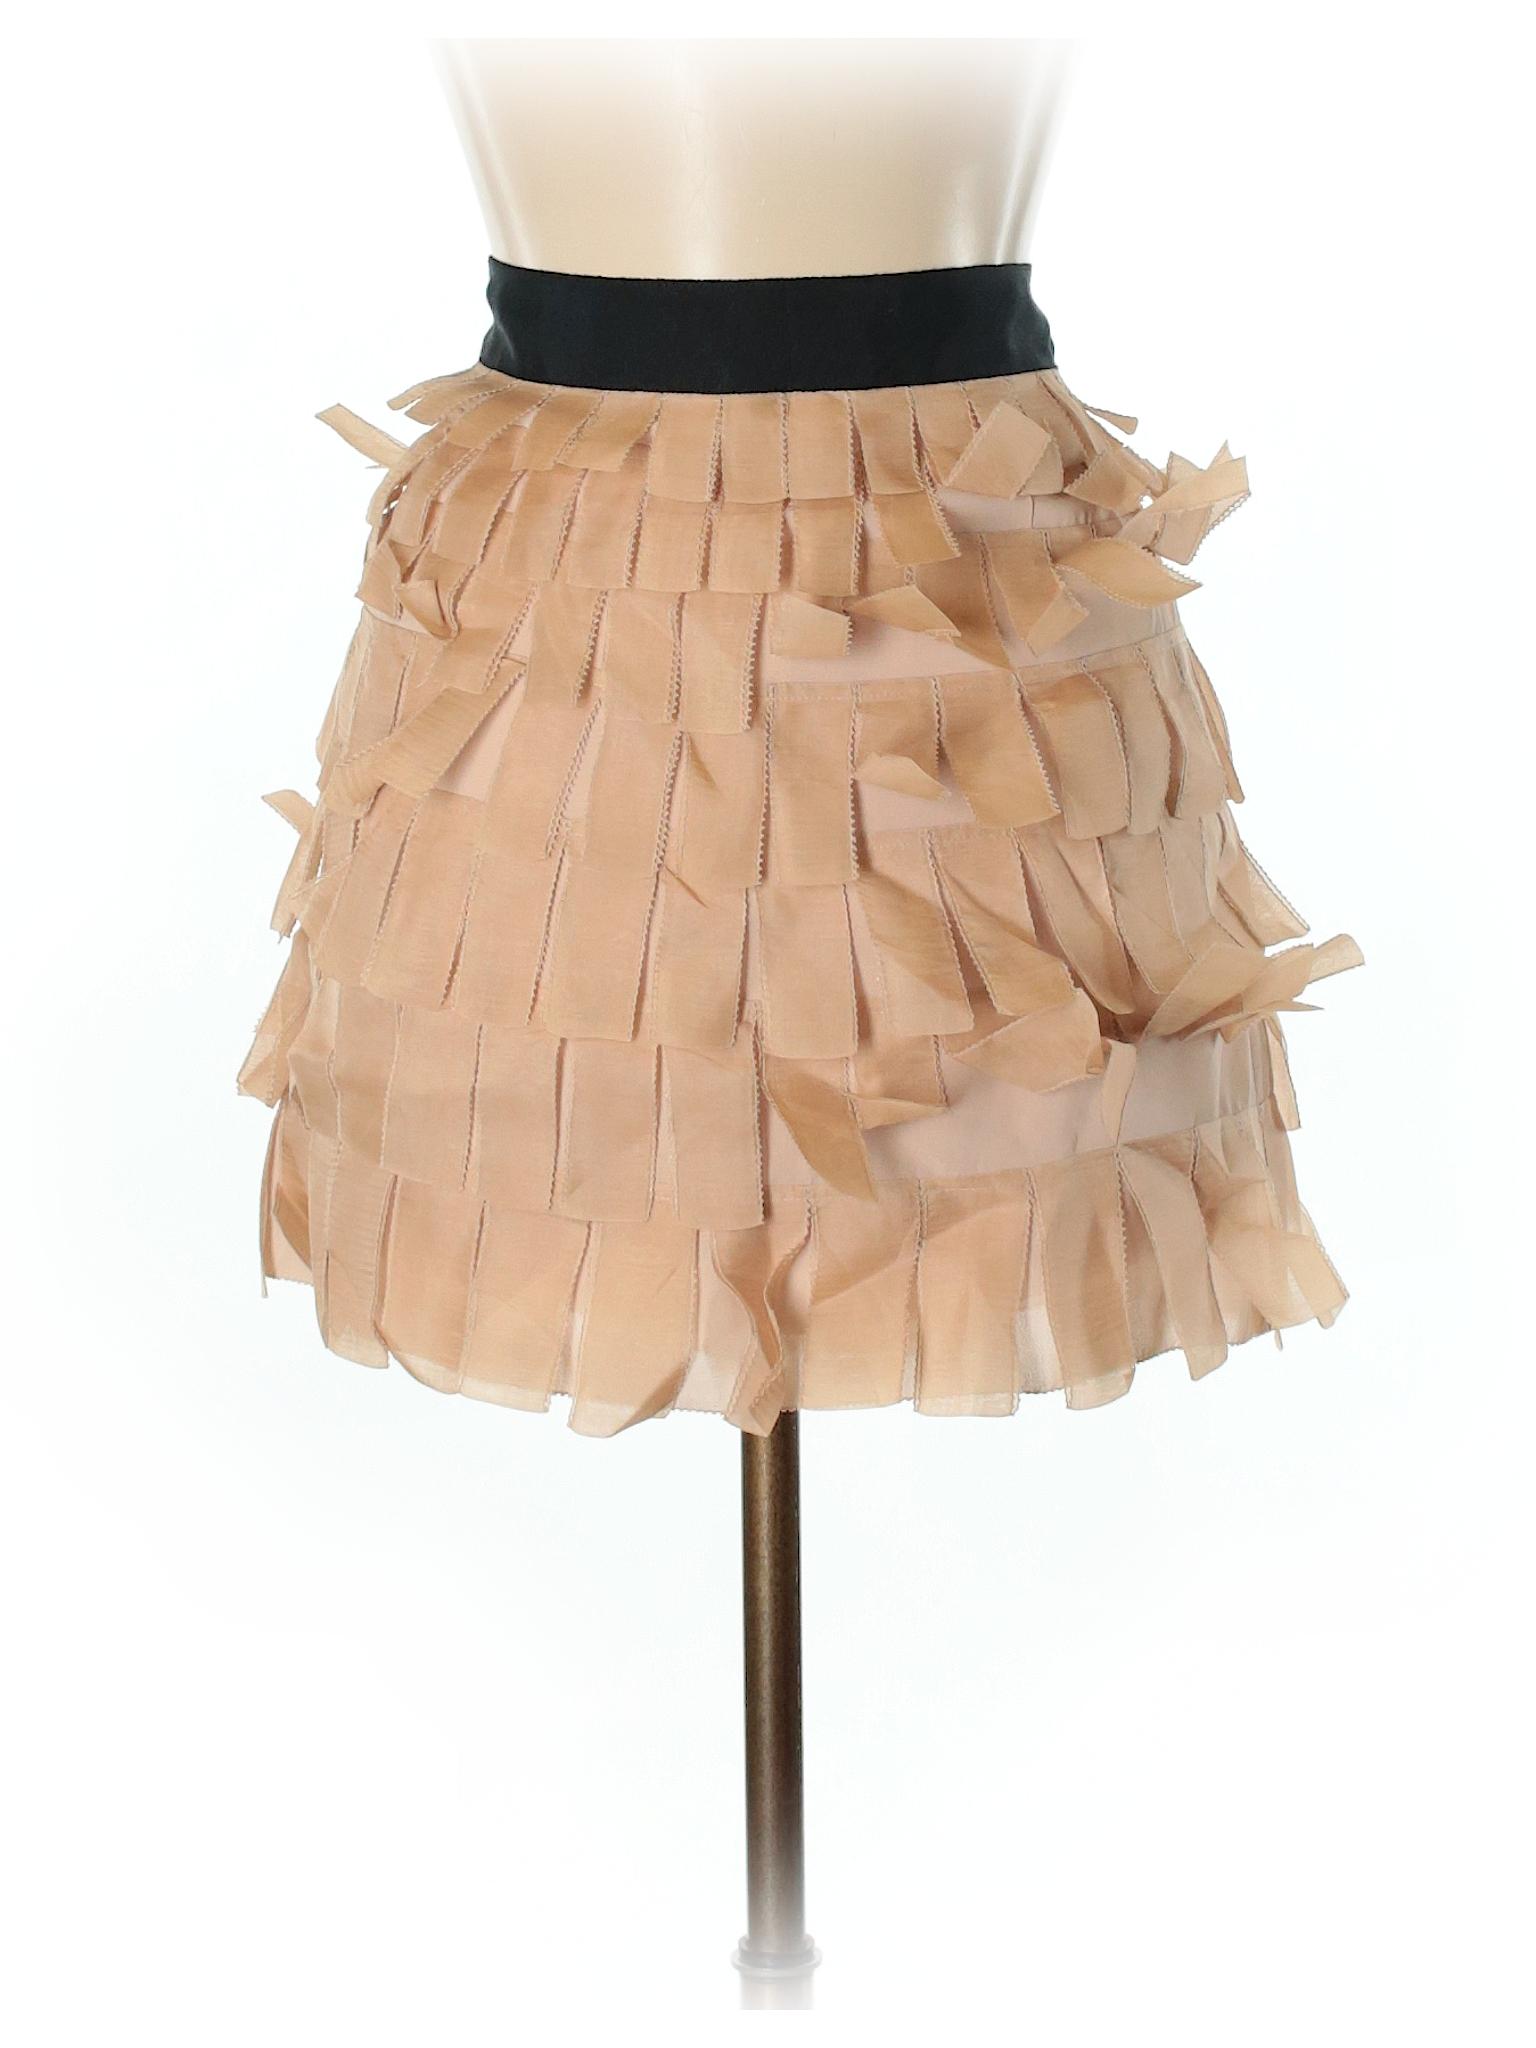 Boutique Silk Skirt Boutique Boutique Silk Silk Skirt Skirt Boutique Silk Skirt Boutique wIqXPwvSx